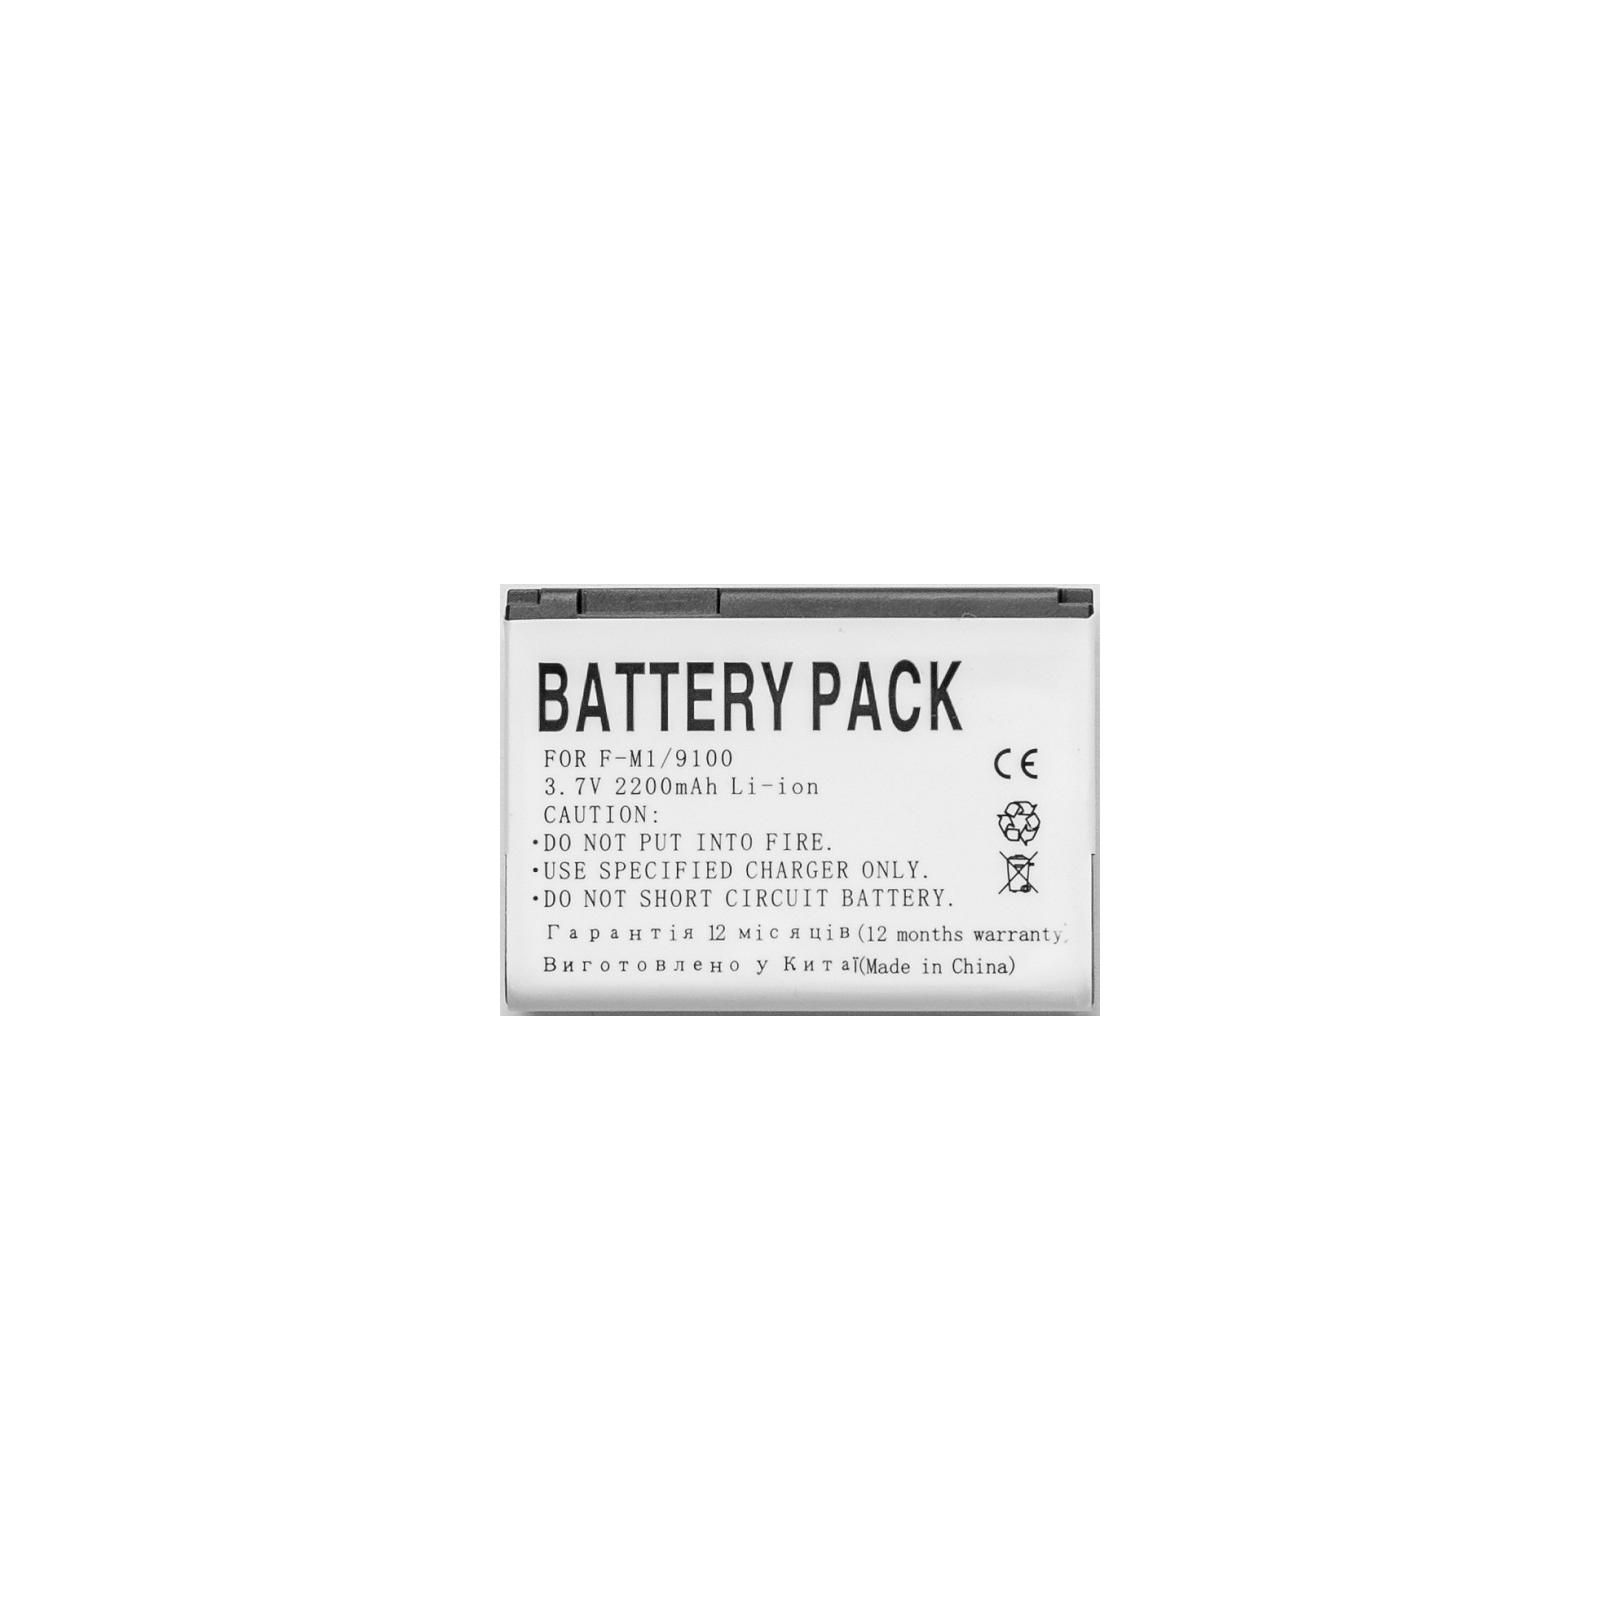 Аккумуляторная батарея PowerPlant Blackberry F-M1 (DV00DV6068) изображение 2